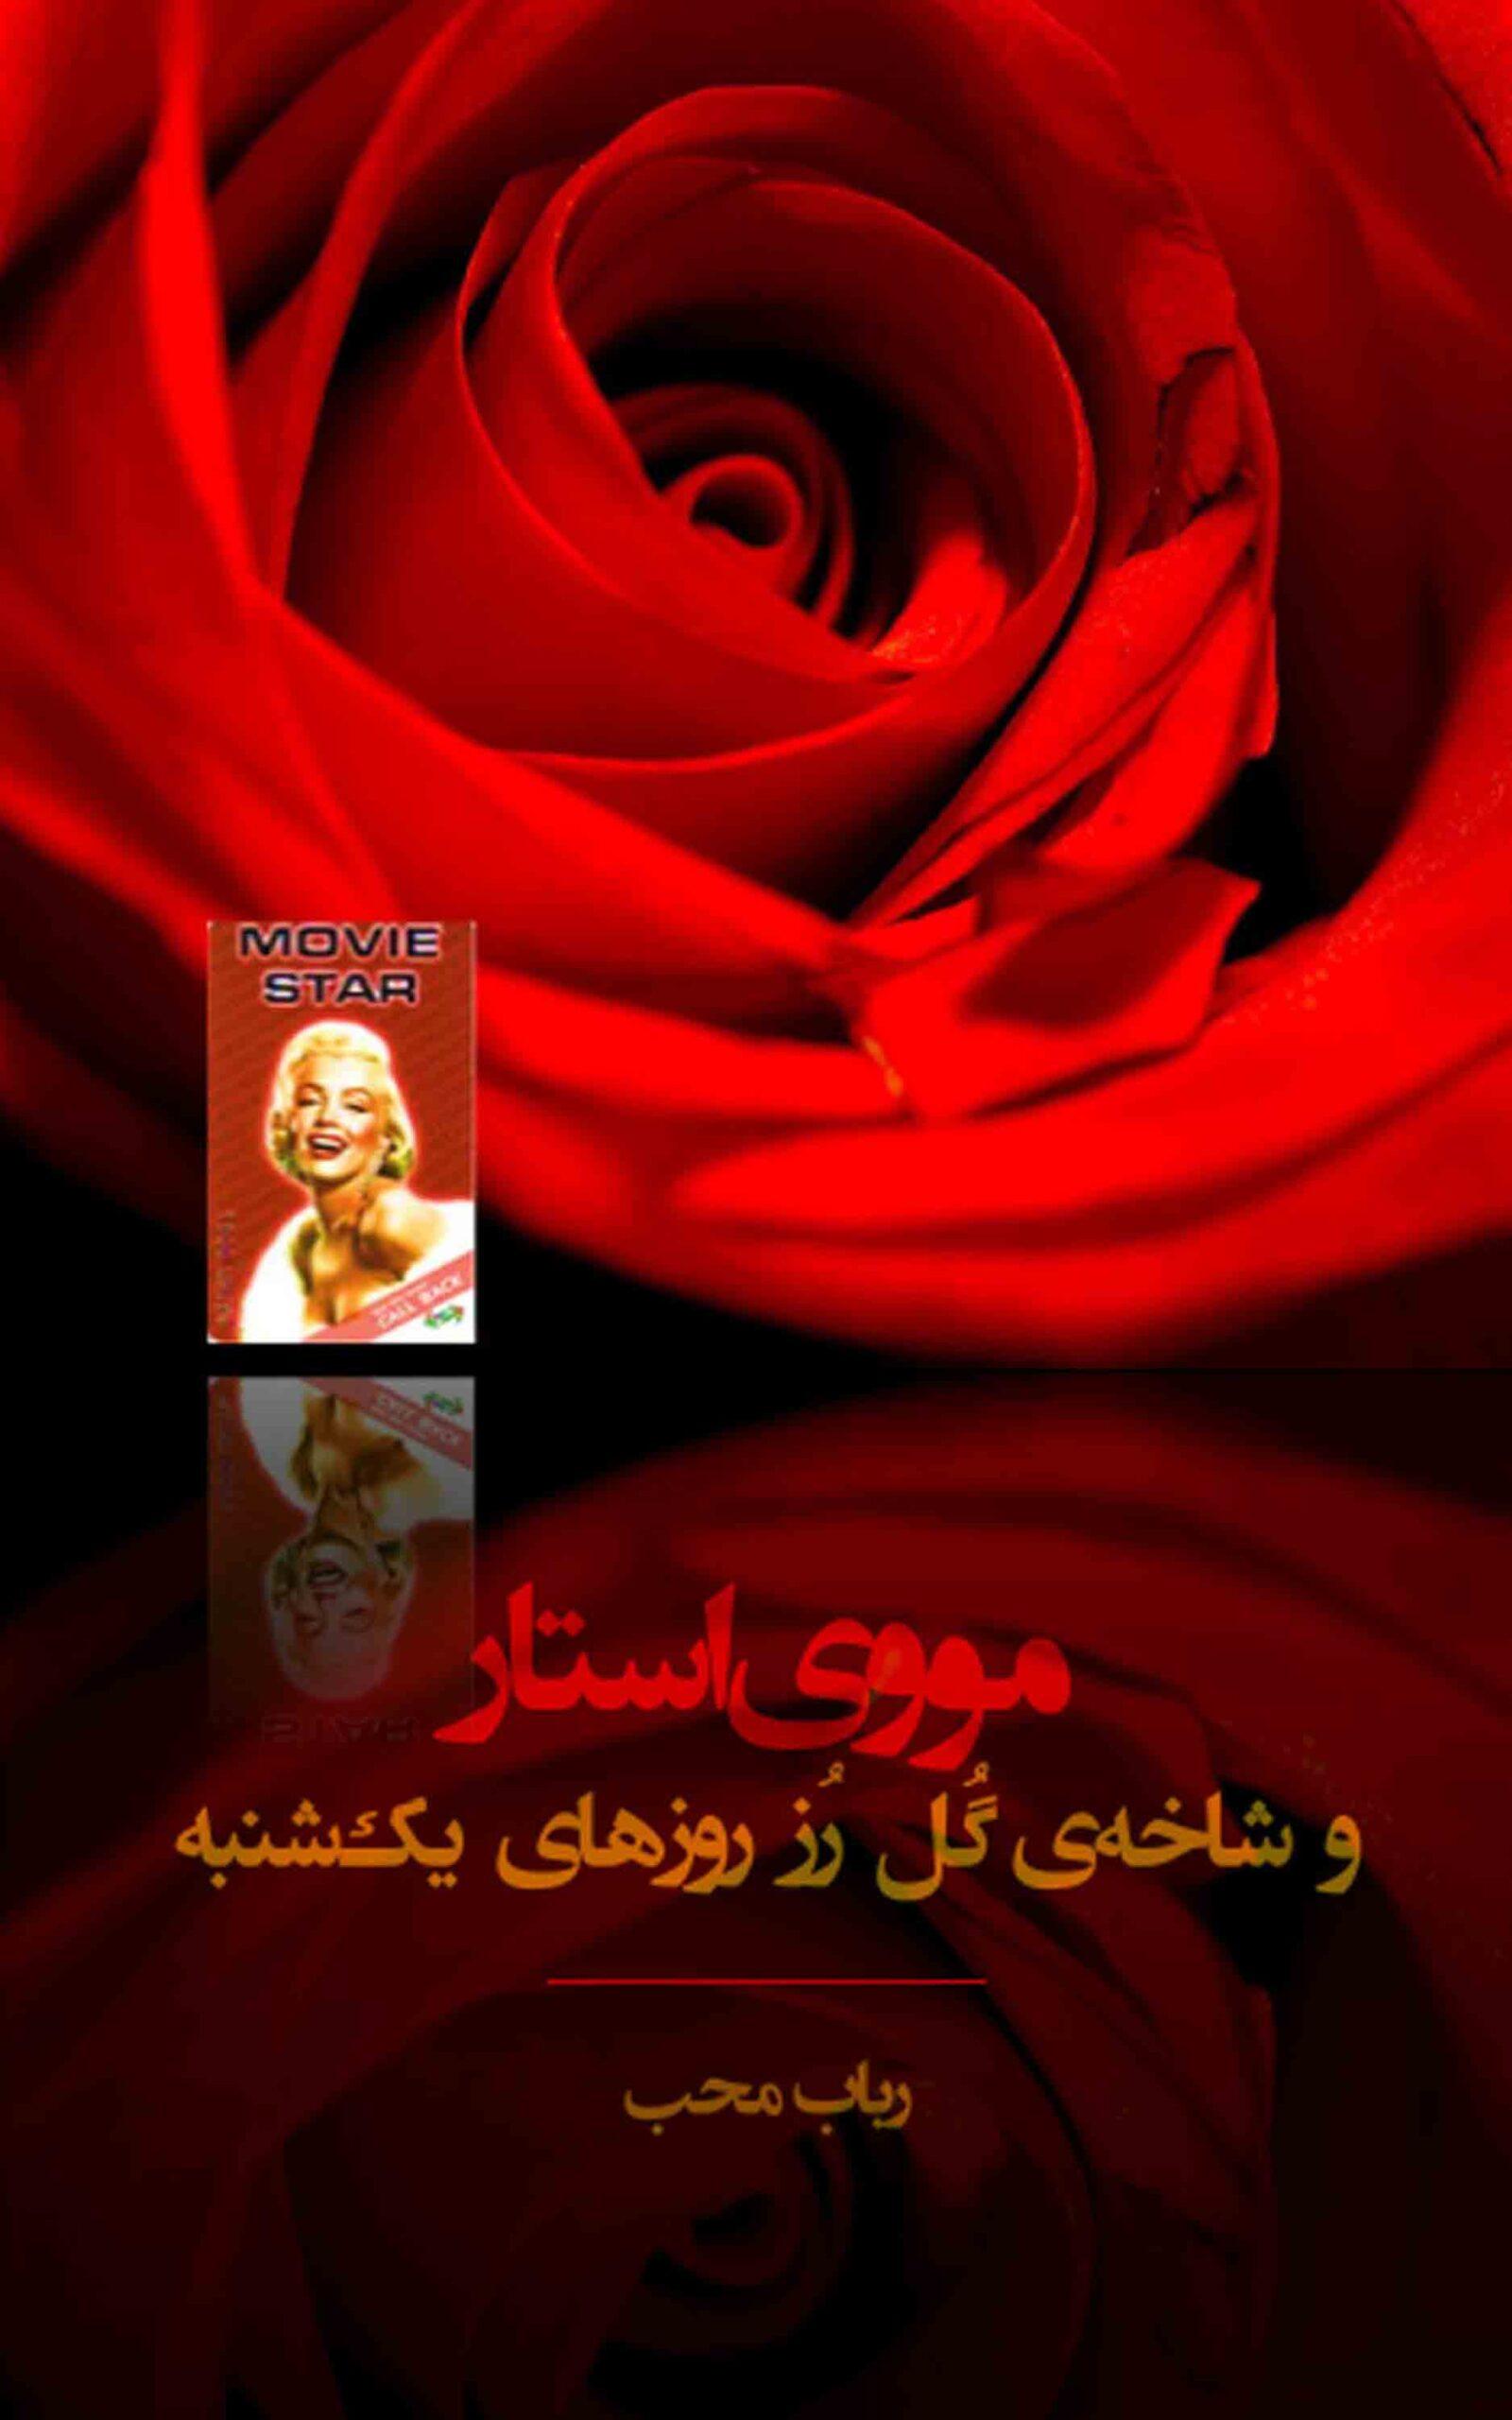 movie star va shaxehye gole roze ruzhaye yekshanbeh (Movie Star and the Sunday's Rose)